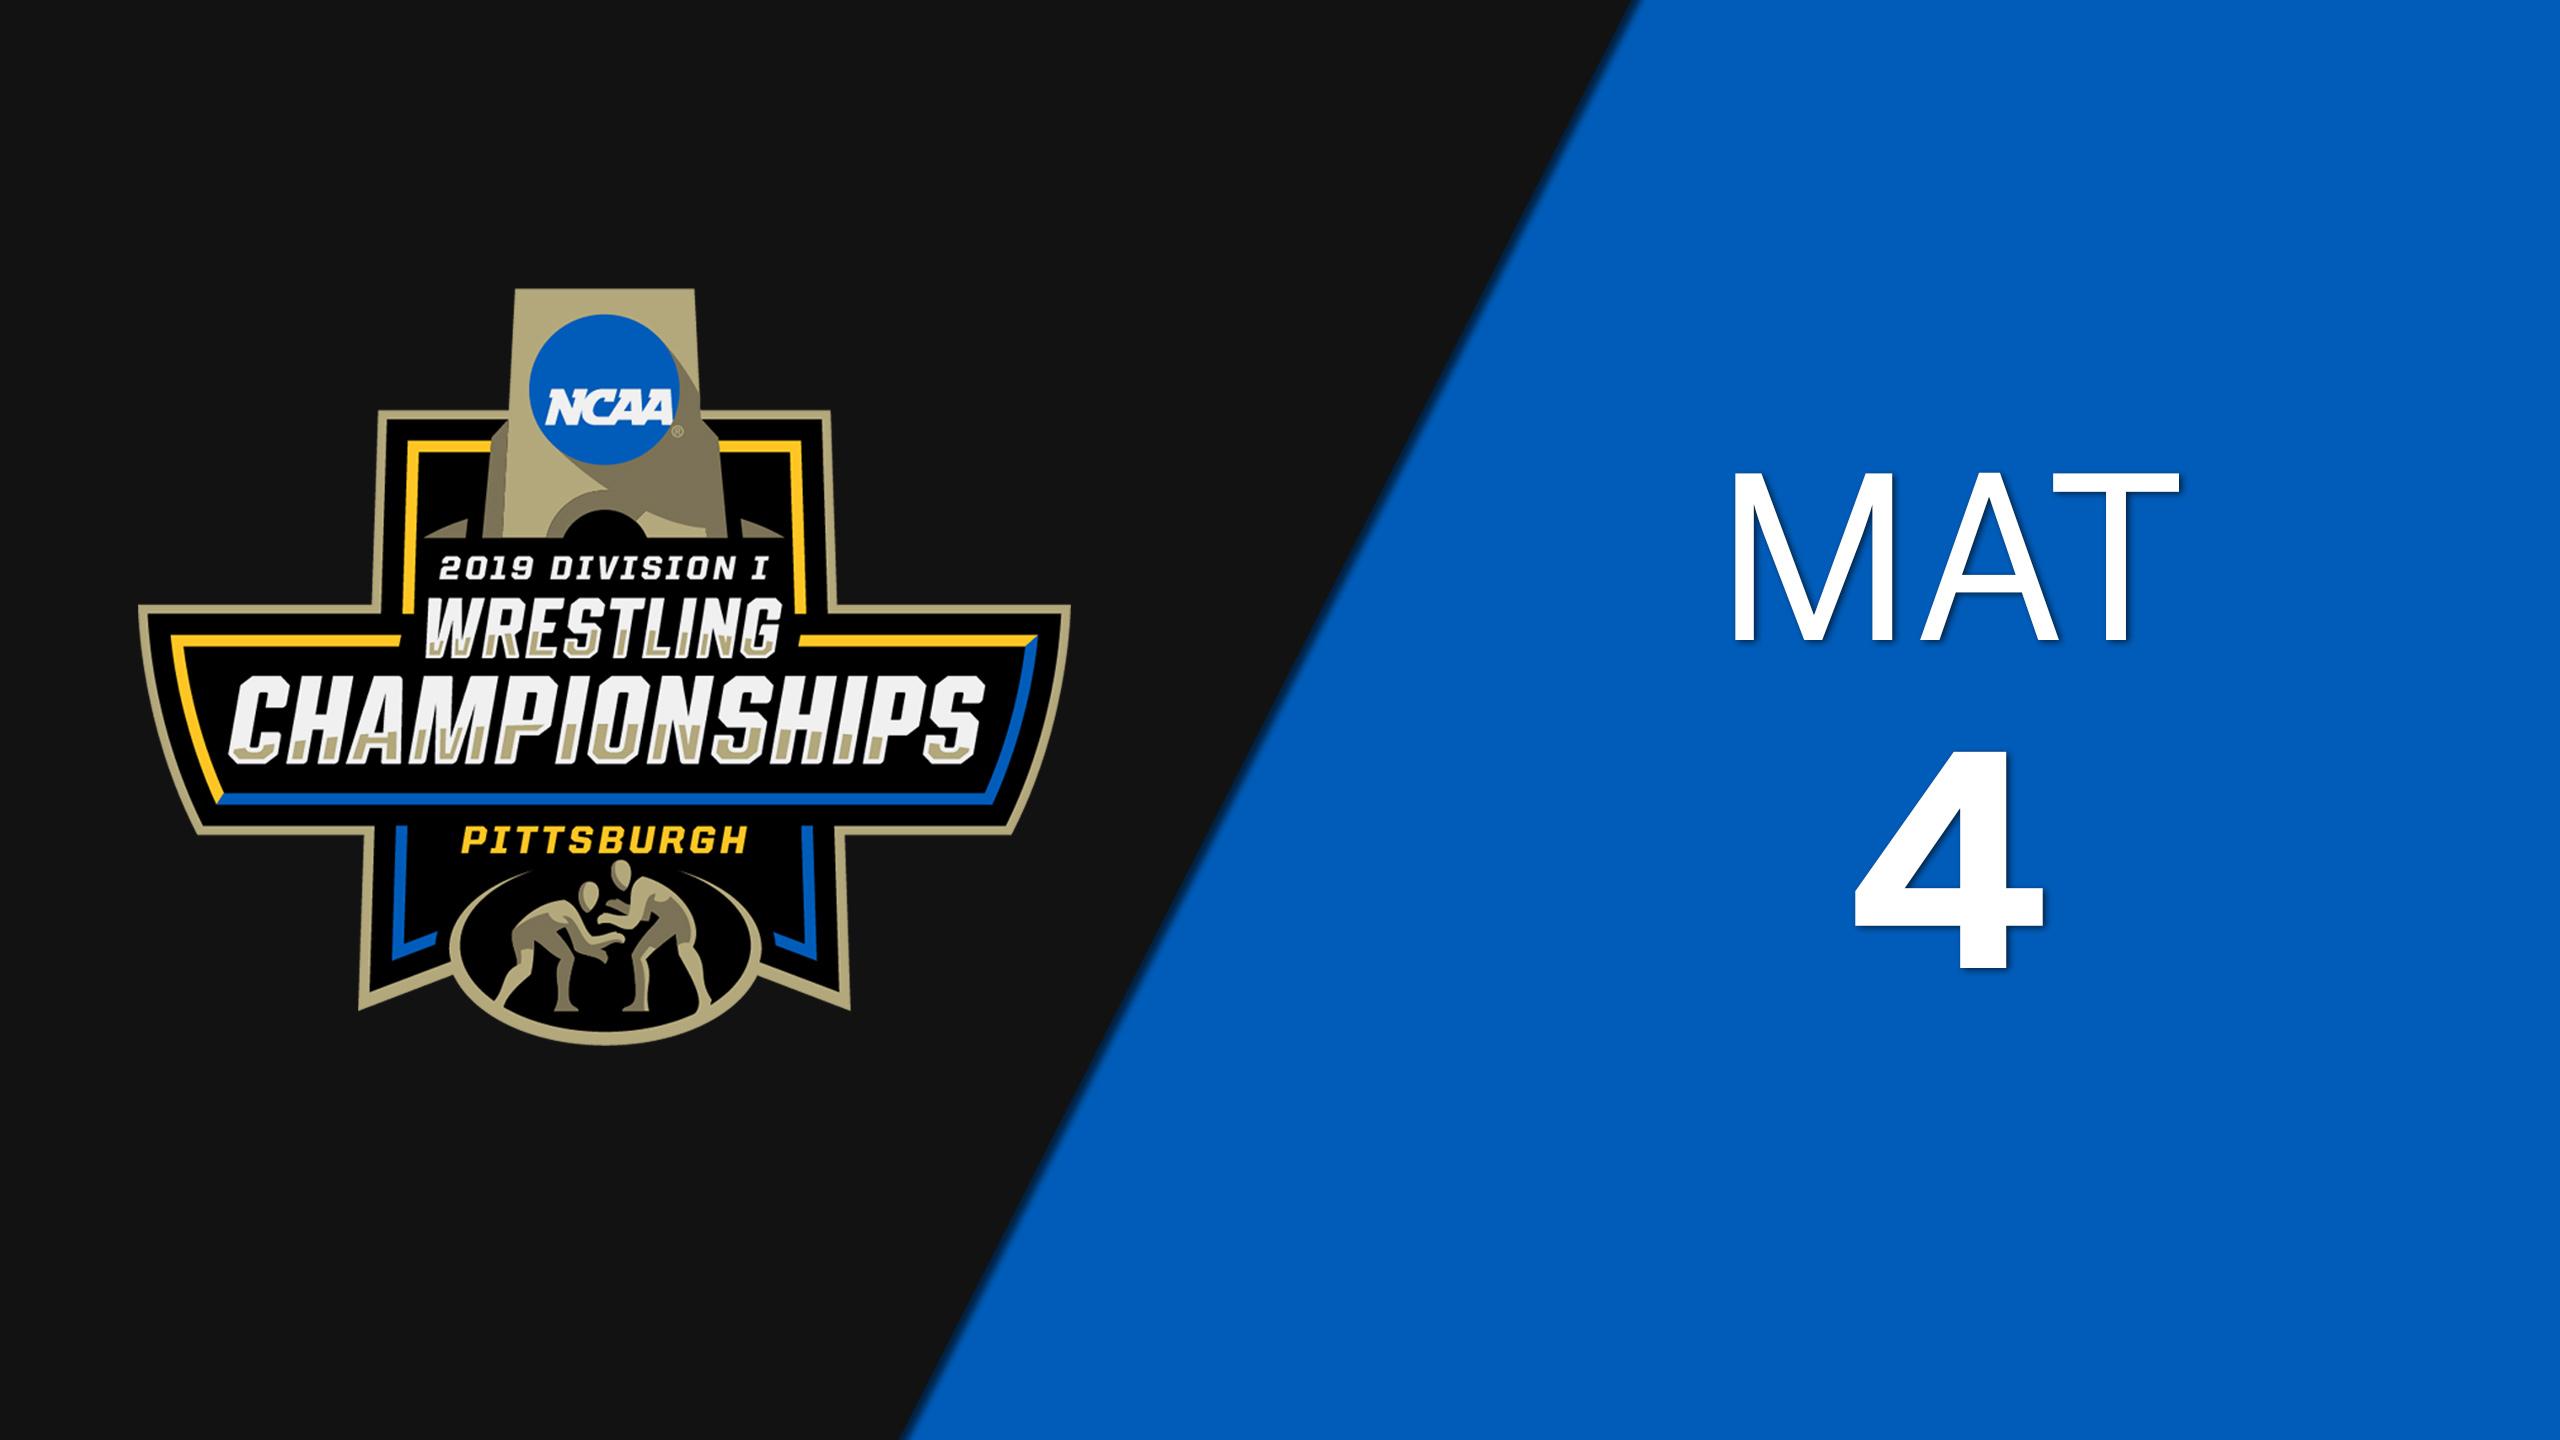 NCAA Wrestling Championship (Mat 5, First Round)